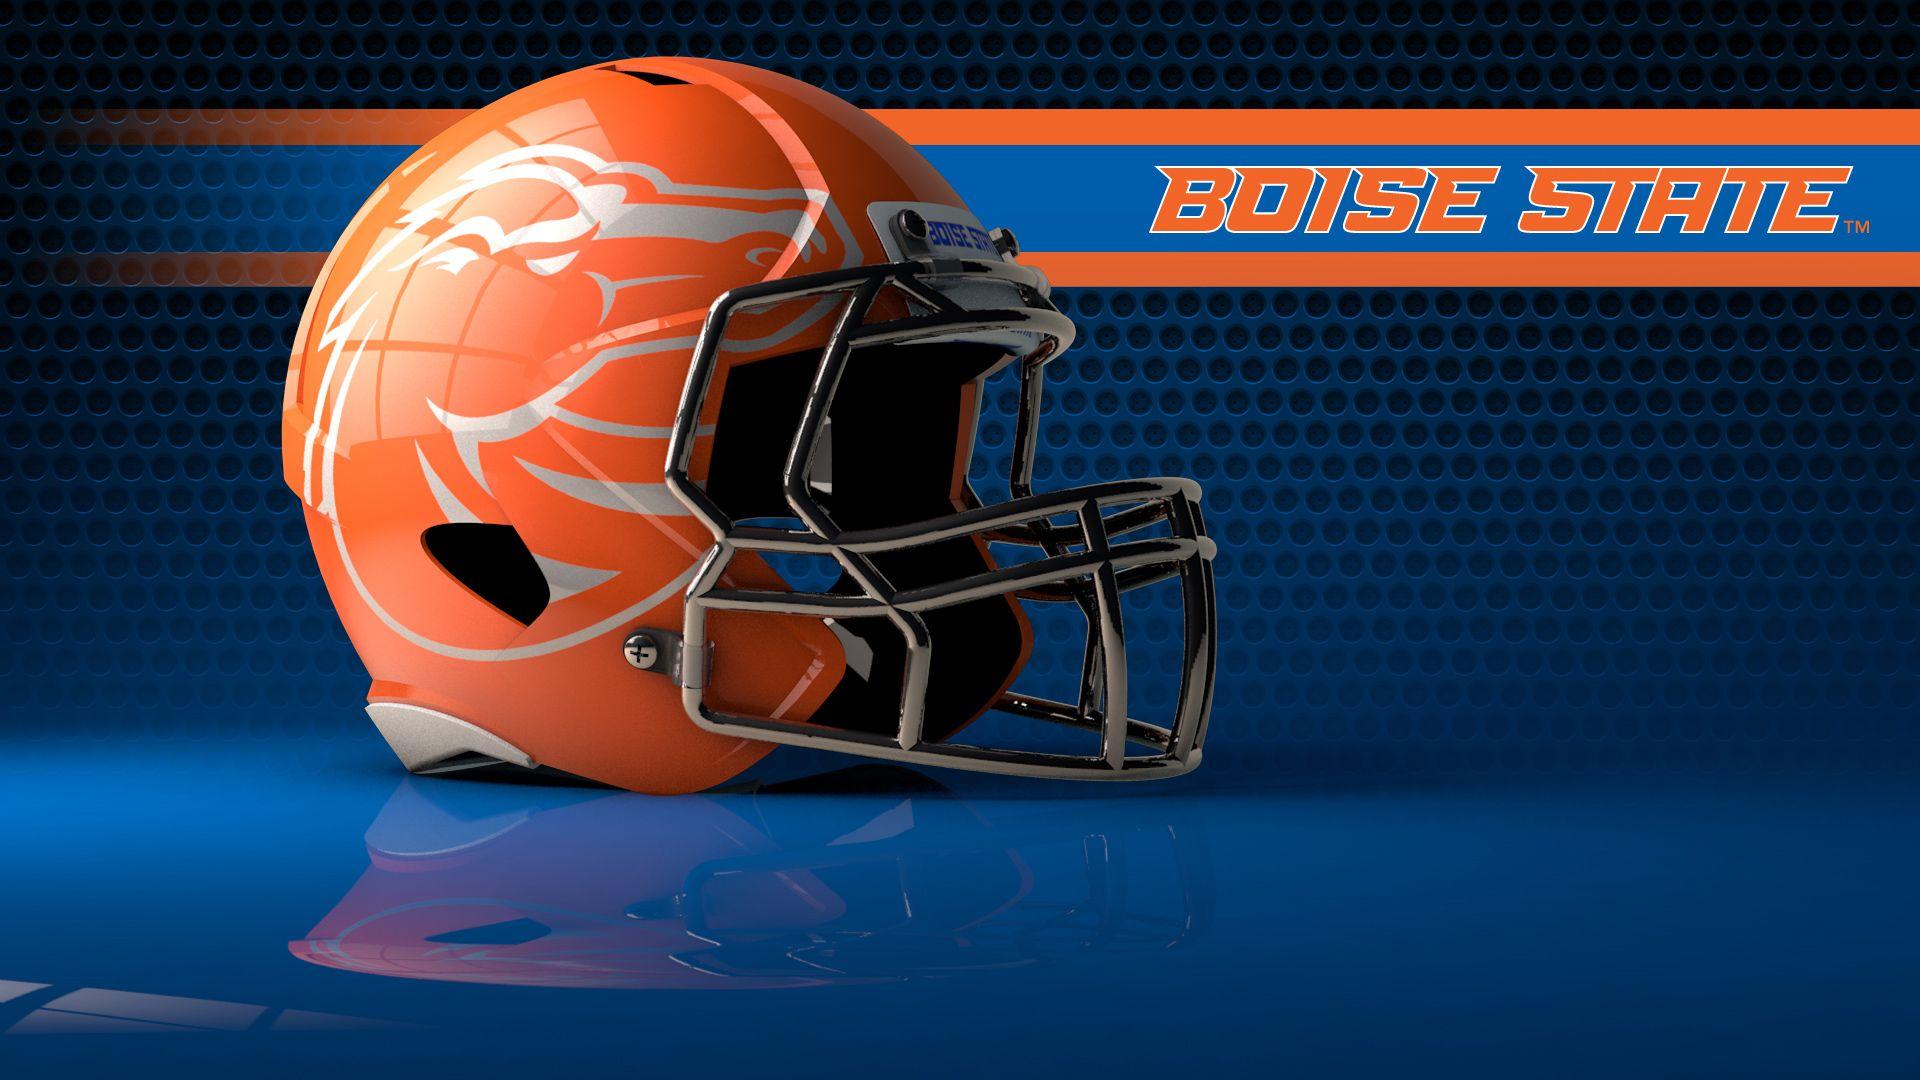 Pin By Travis On My Teams Football Helmets Football Boise State Football